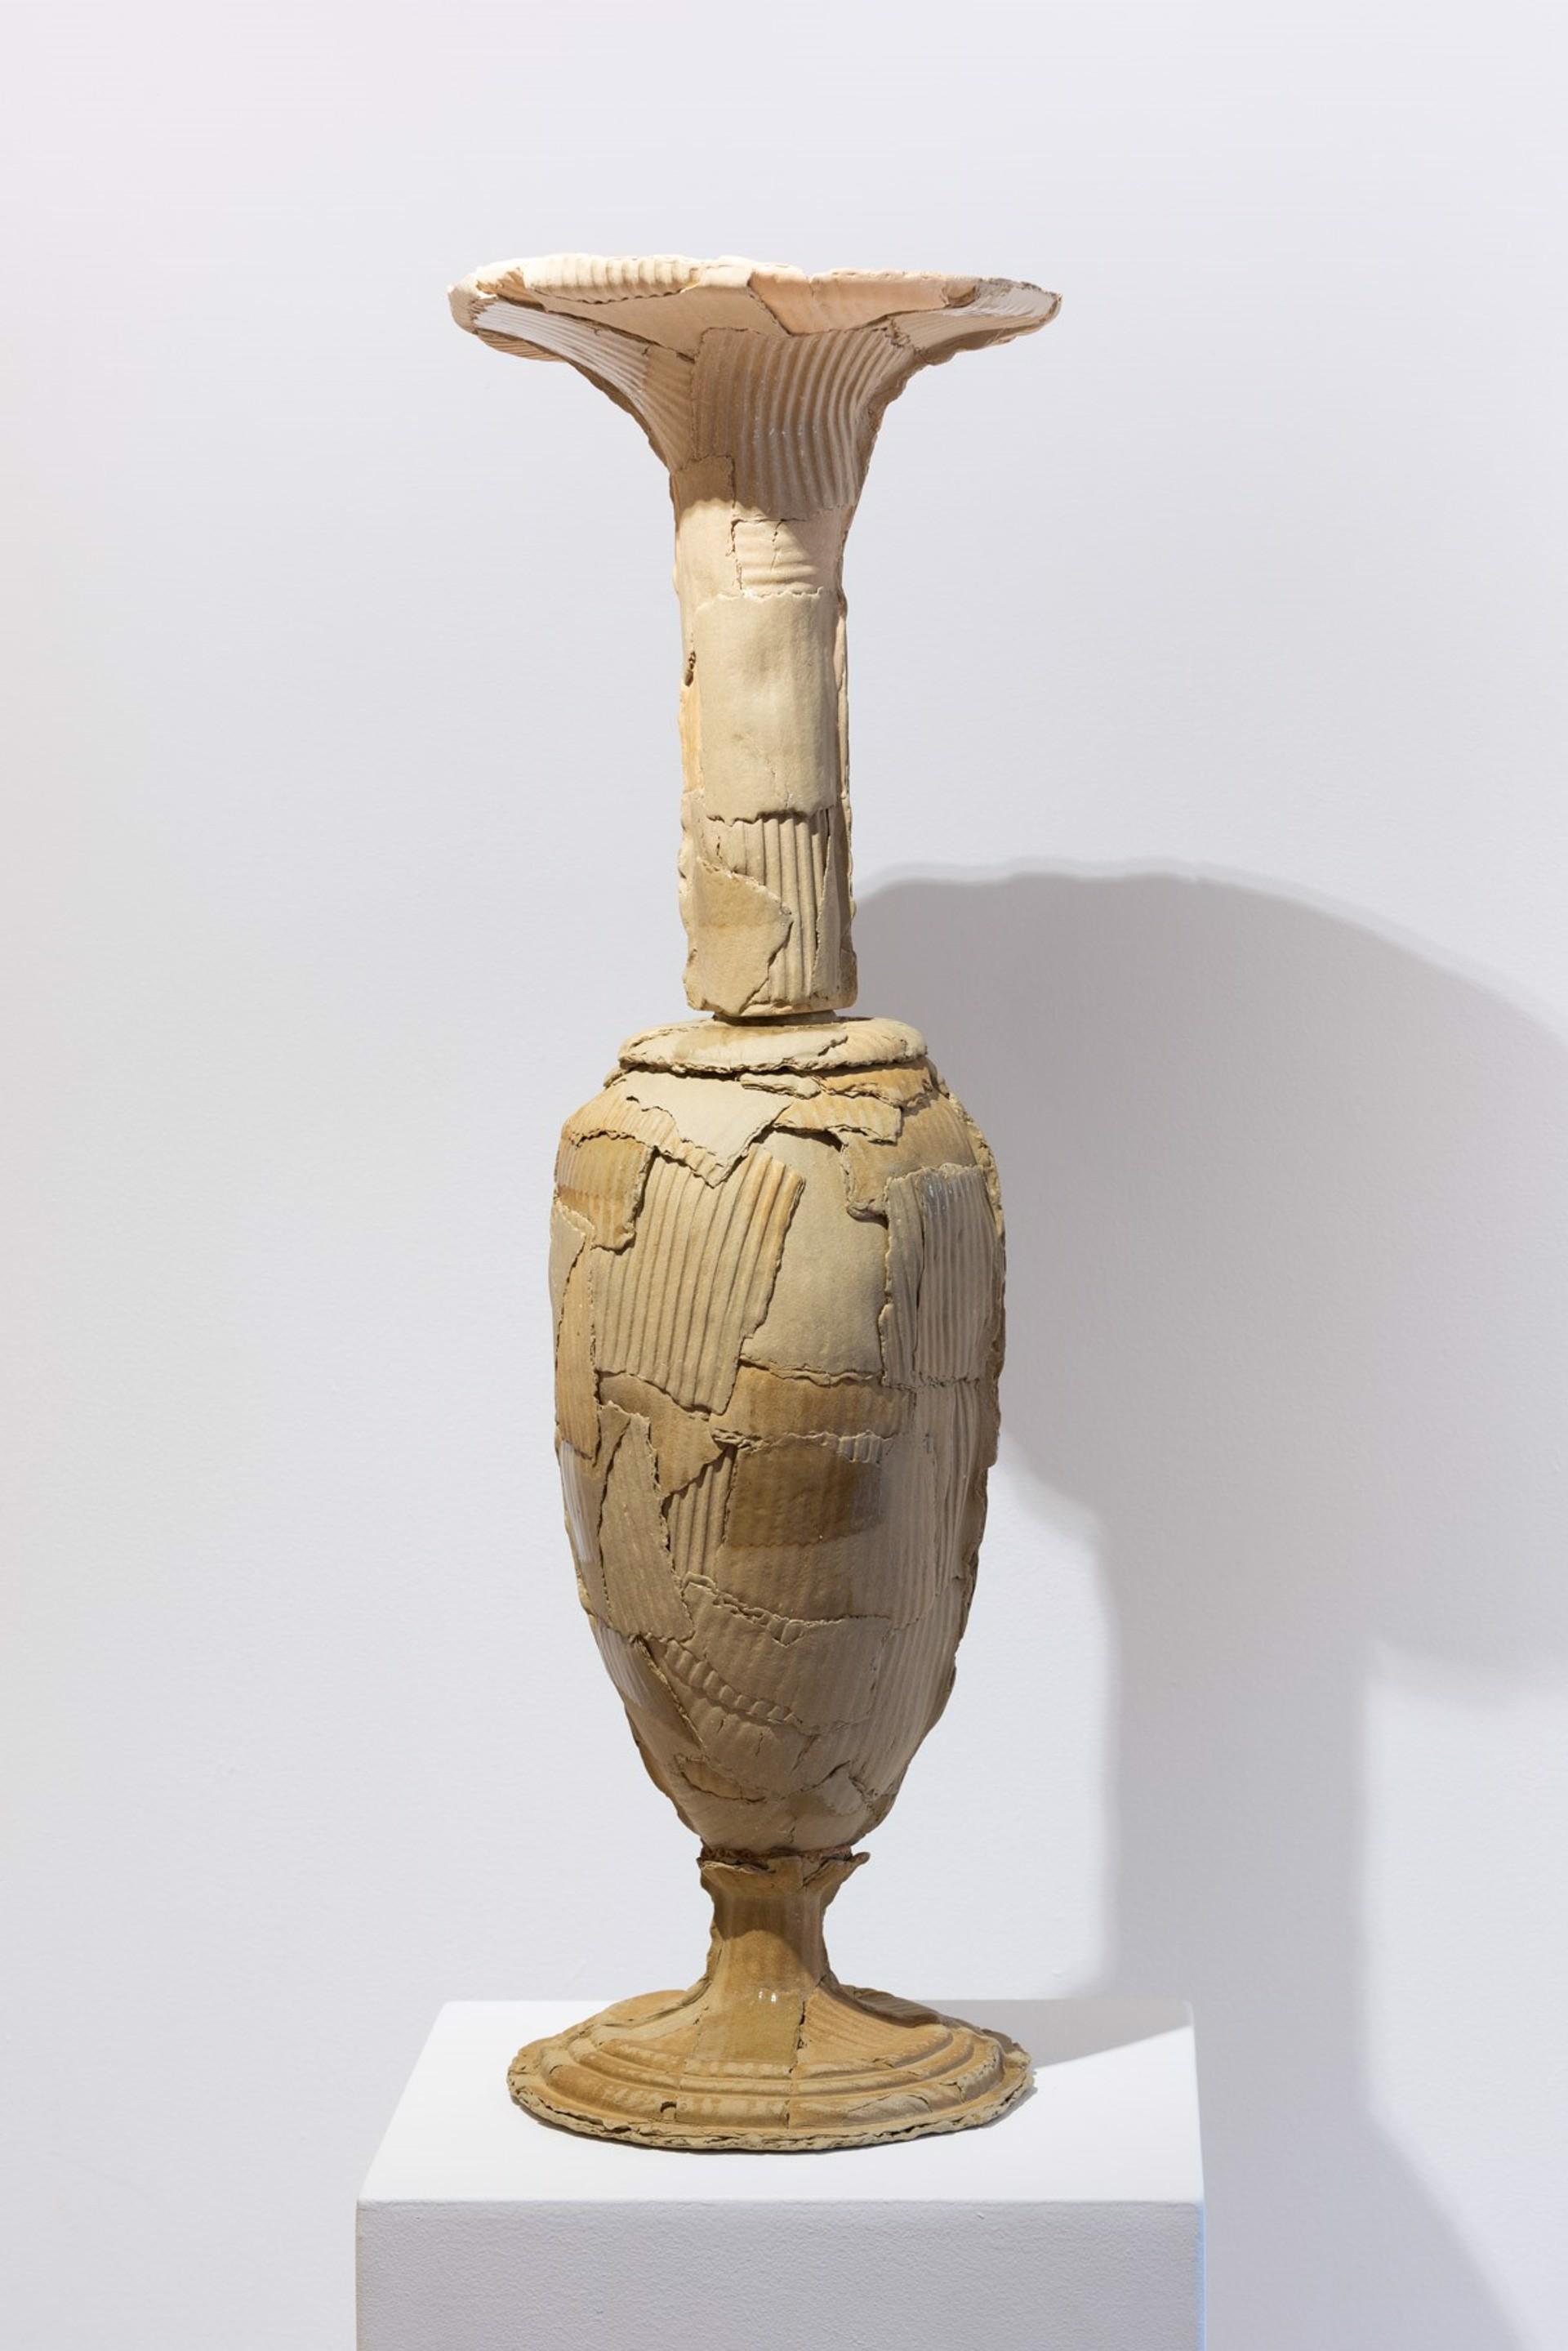 Tall Vase (no handles) by Tim Kowalzcyk